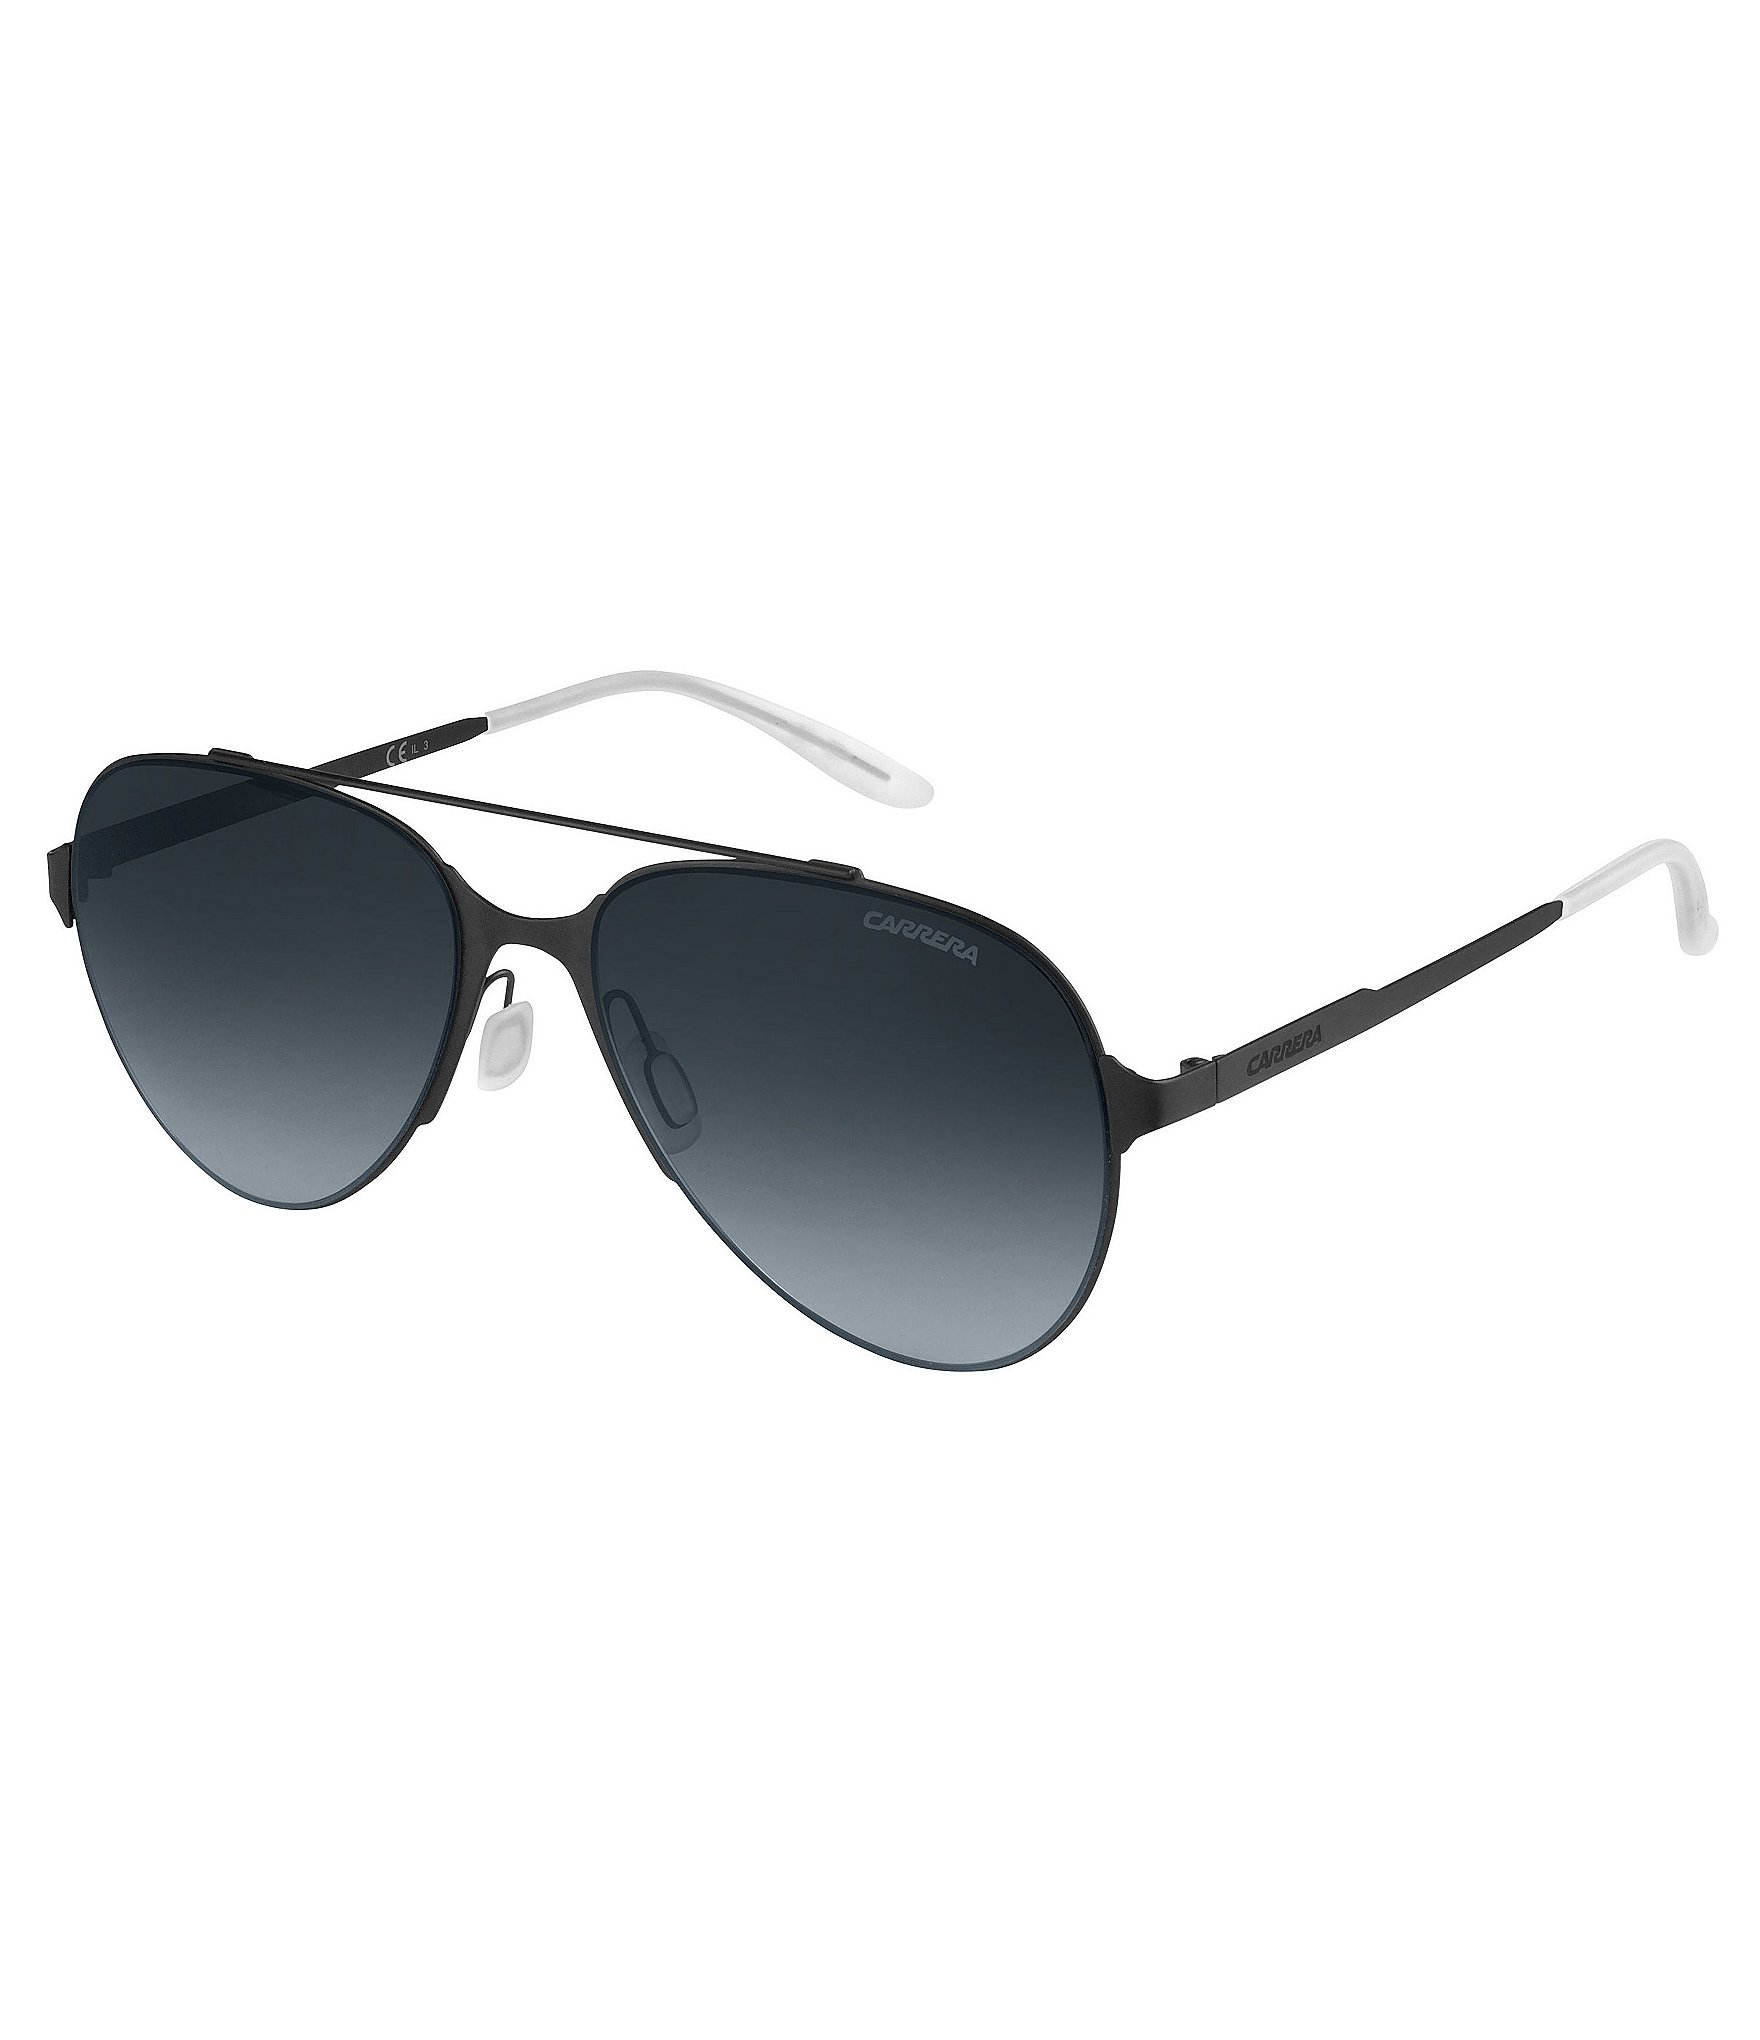 63627cc07359c Lyst - Carrera Double-bridge Aviator Sunglasses in Black for Men